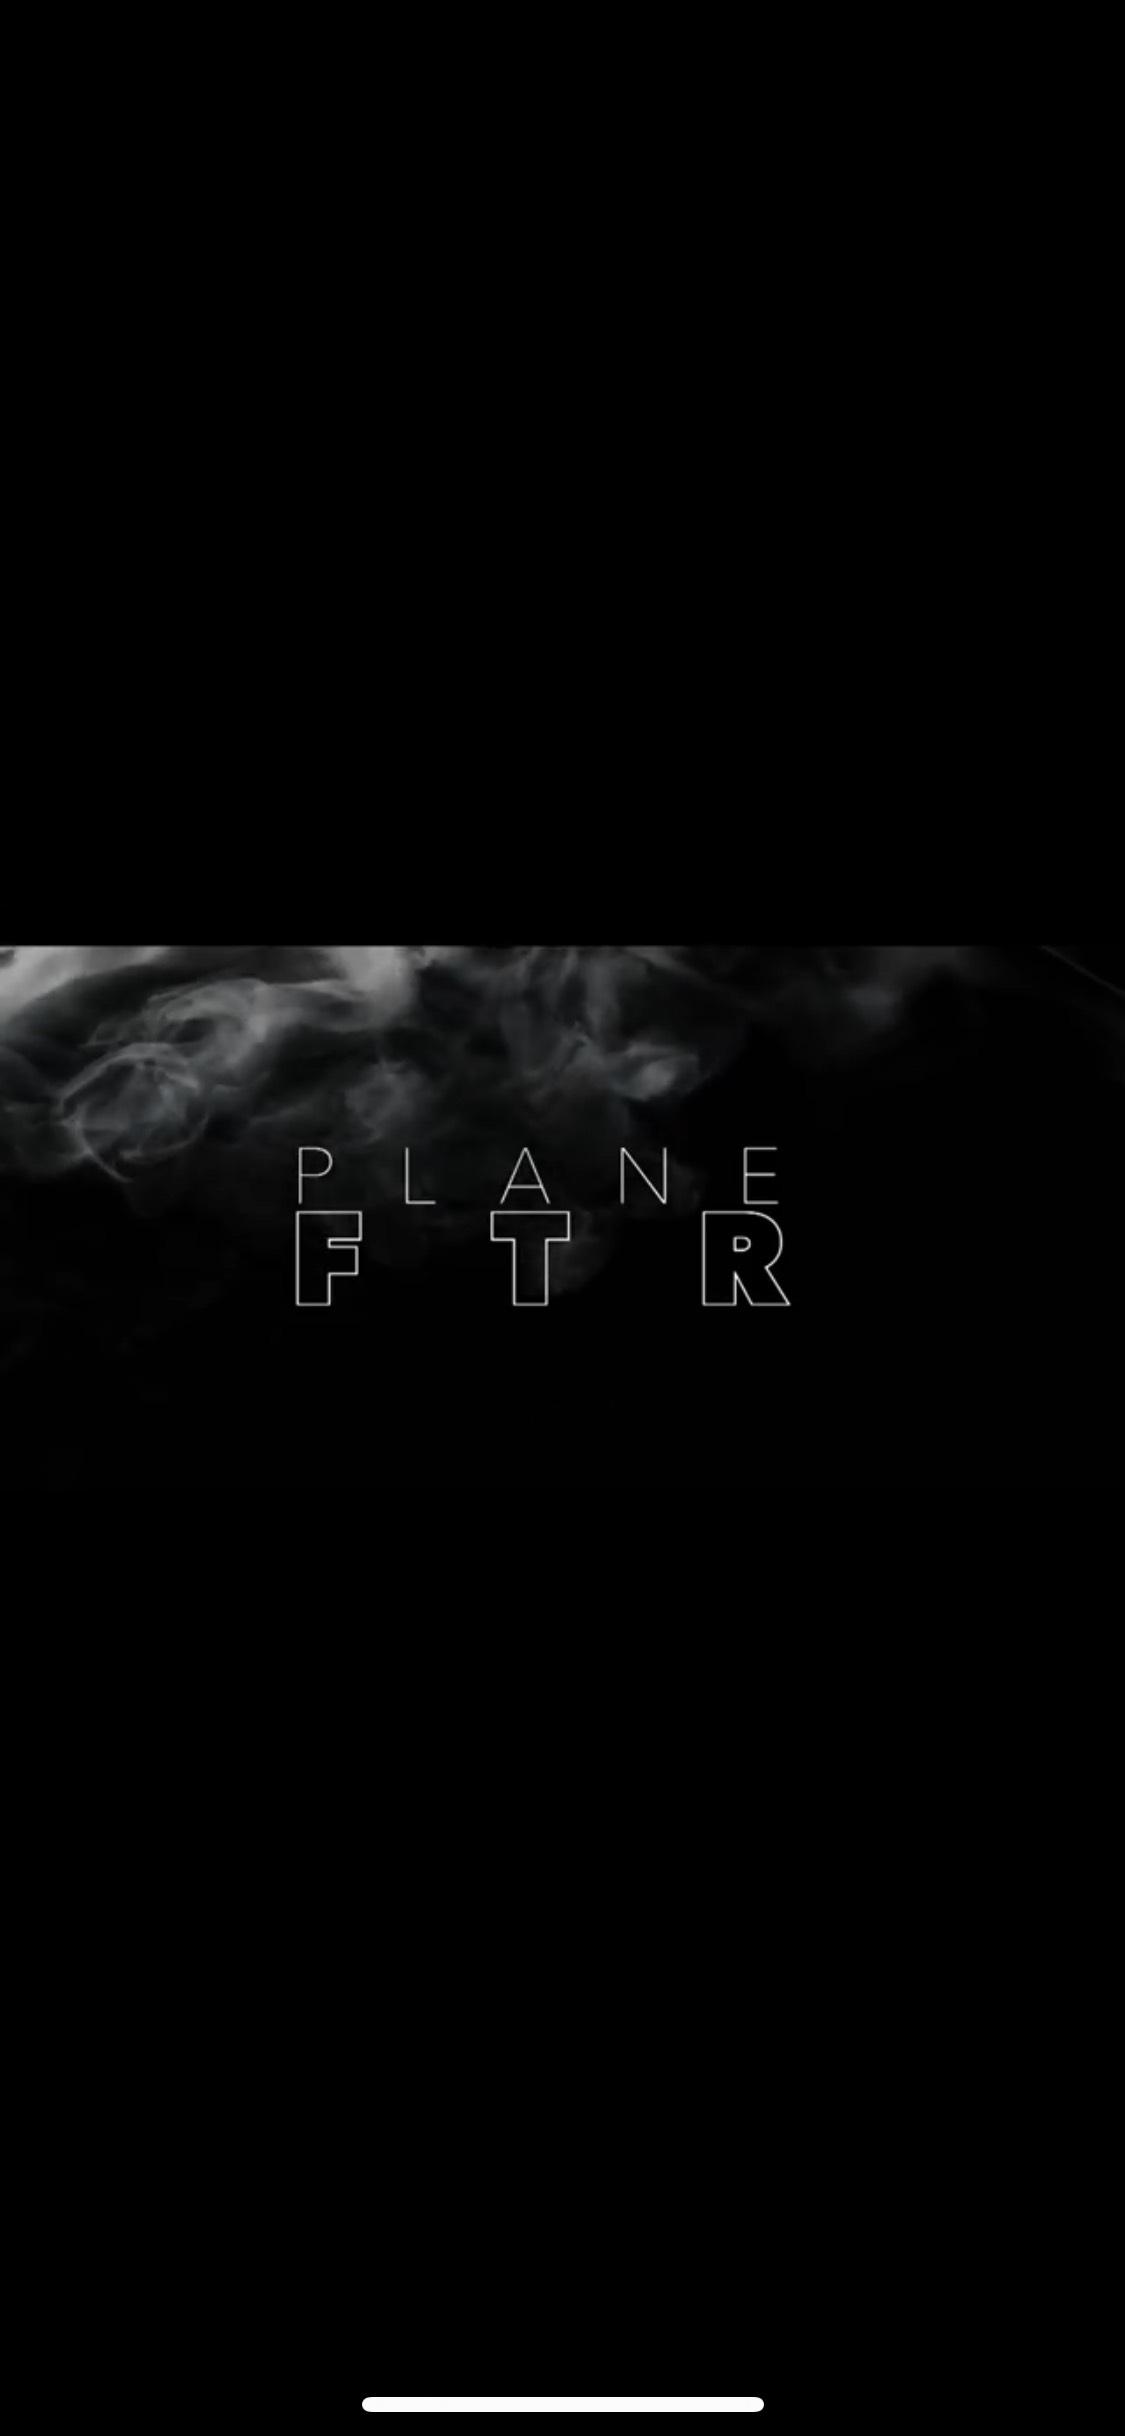 "PREMIERE: Airplane James ""PlaneFTR"" Video"